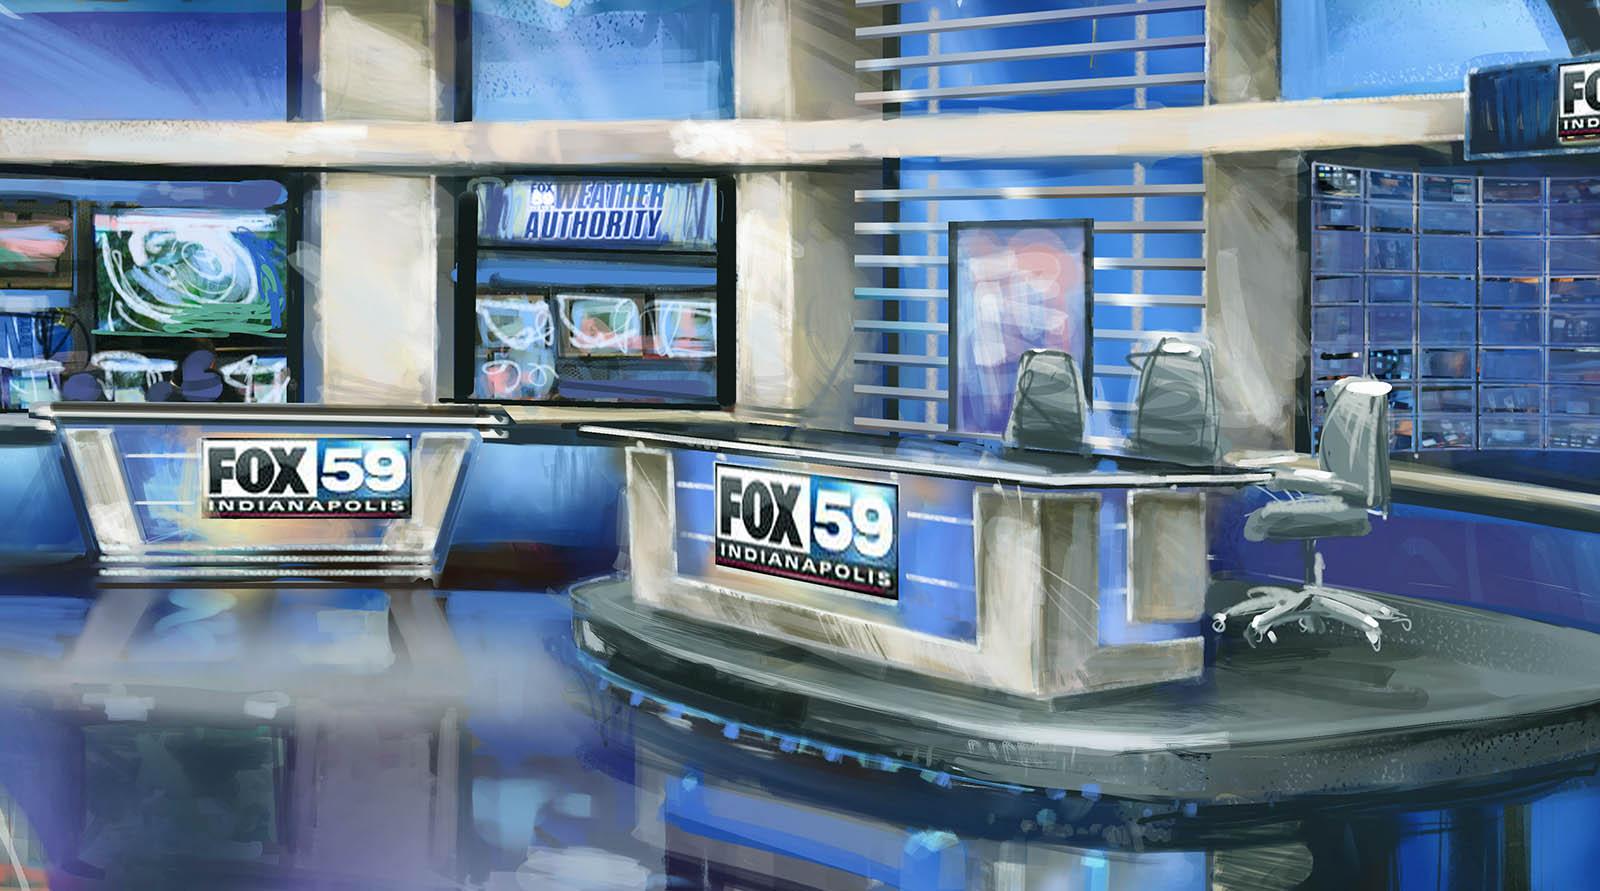 Fox 59 News live streaming studio